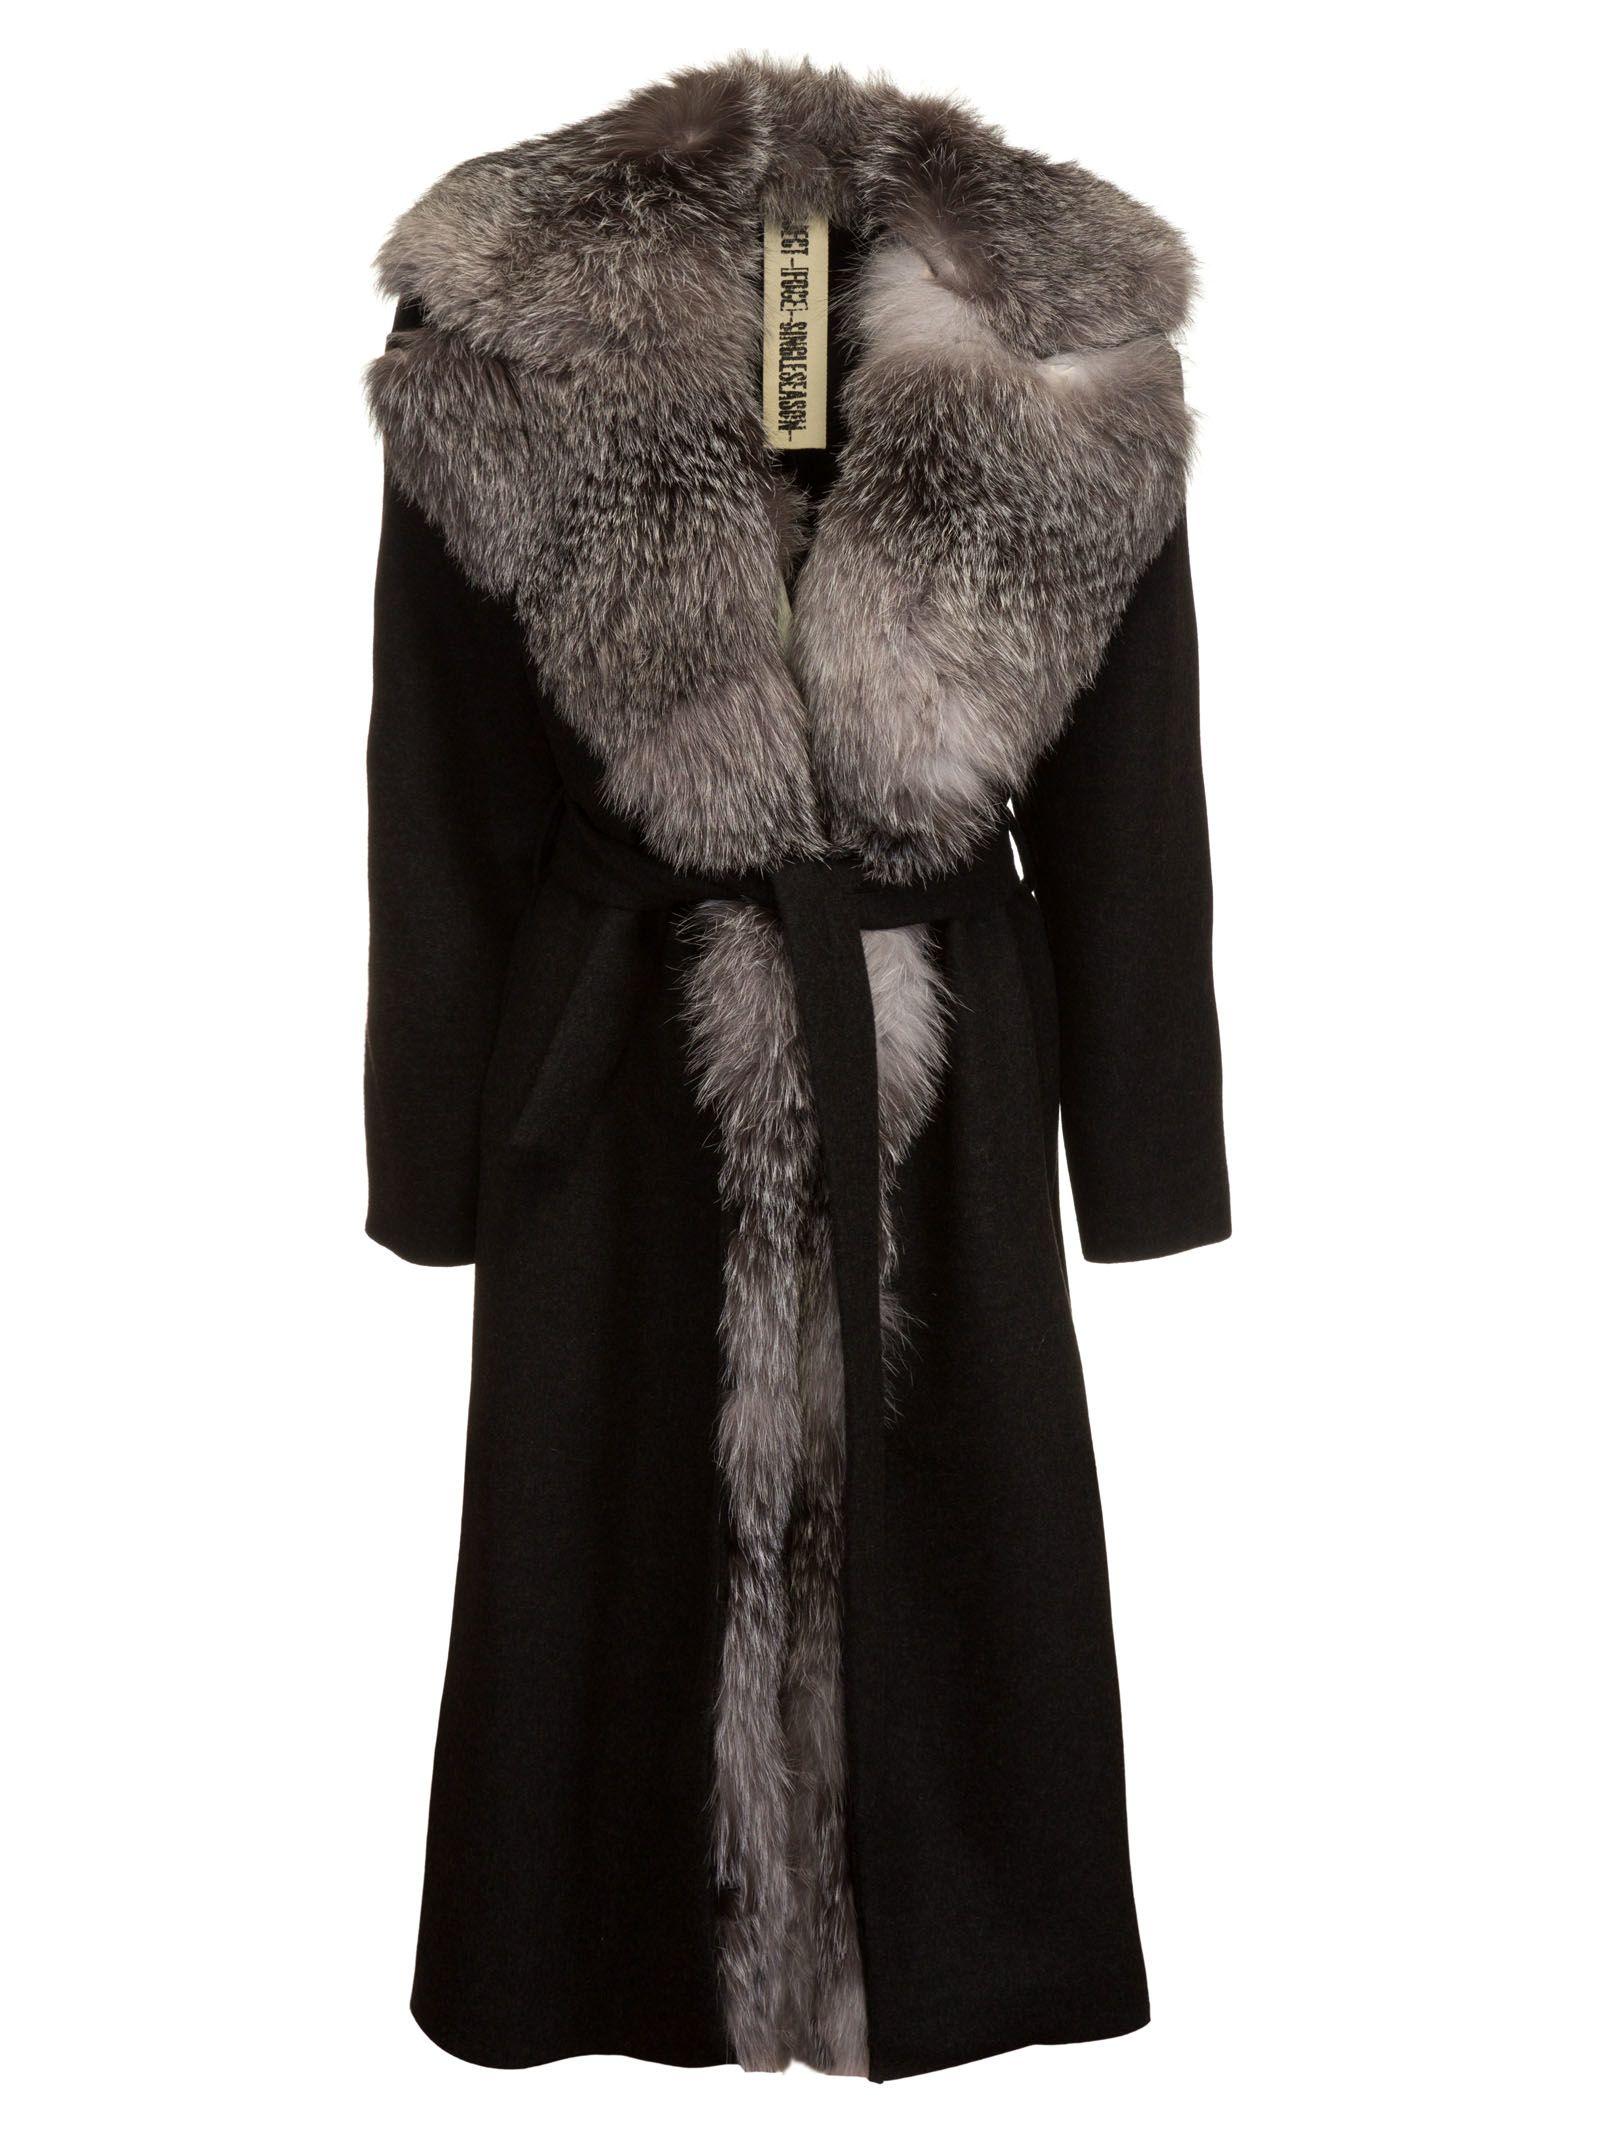 Project [Foce] Belted Waist Fox-Furred Coat